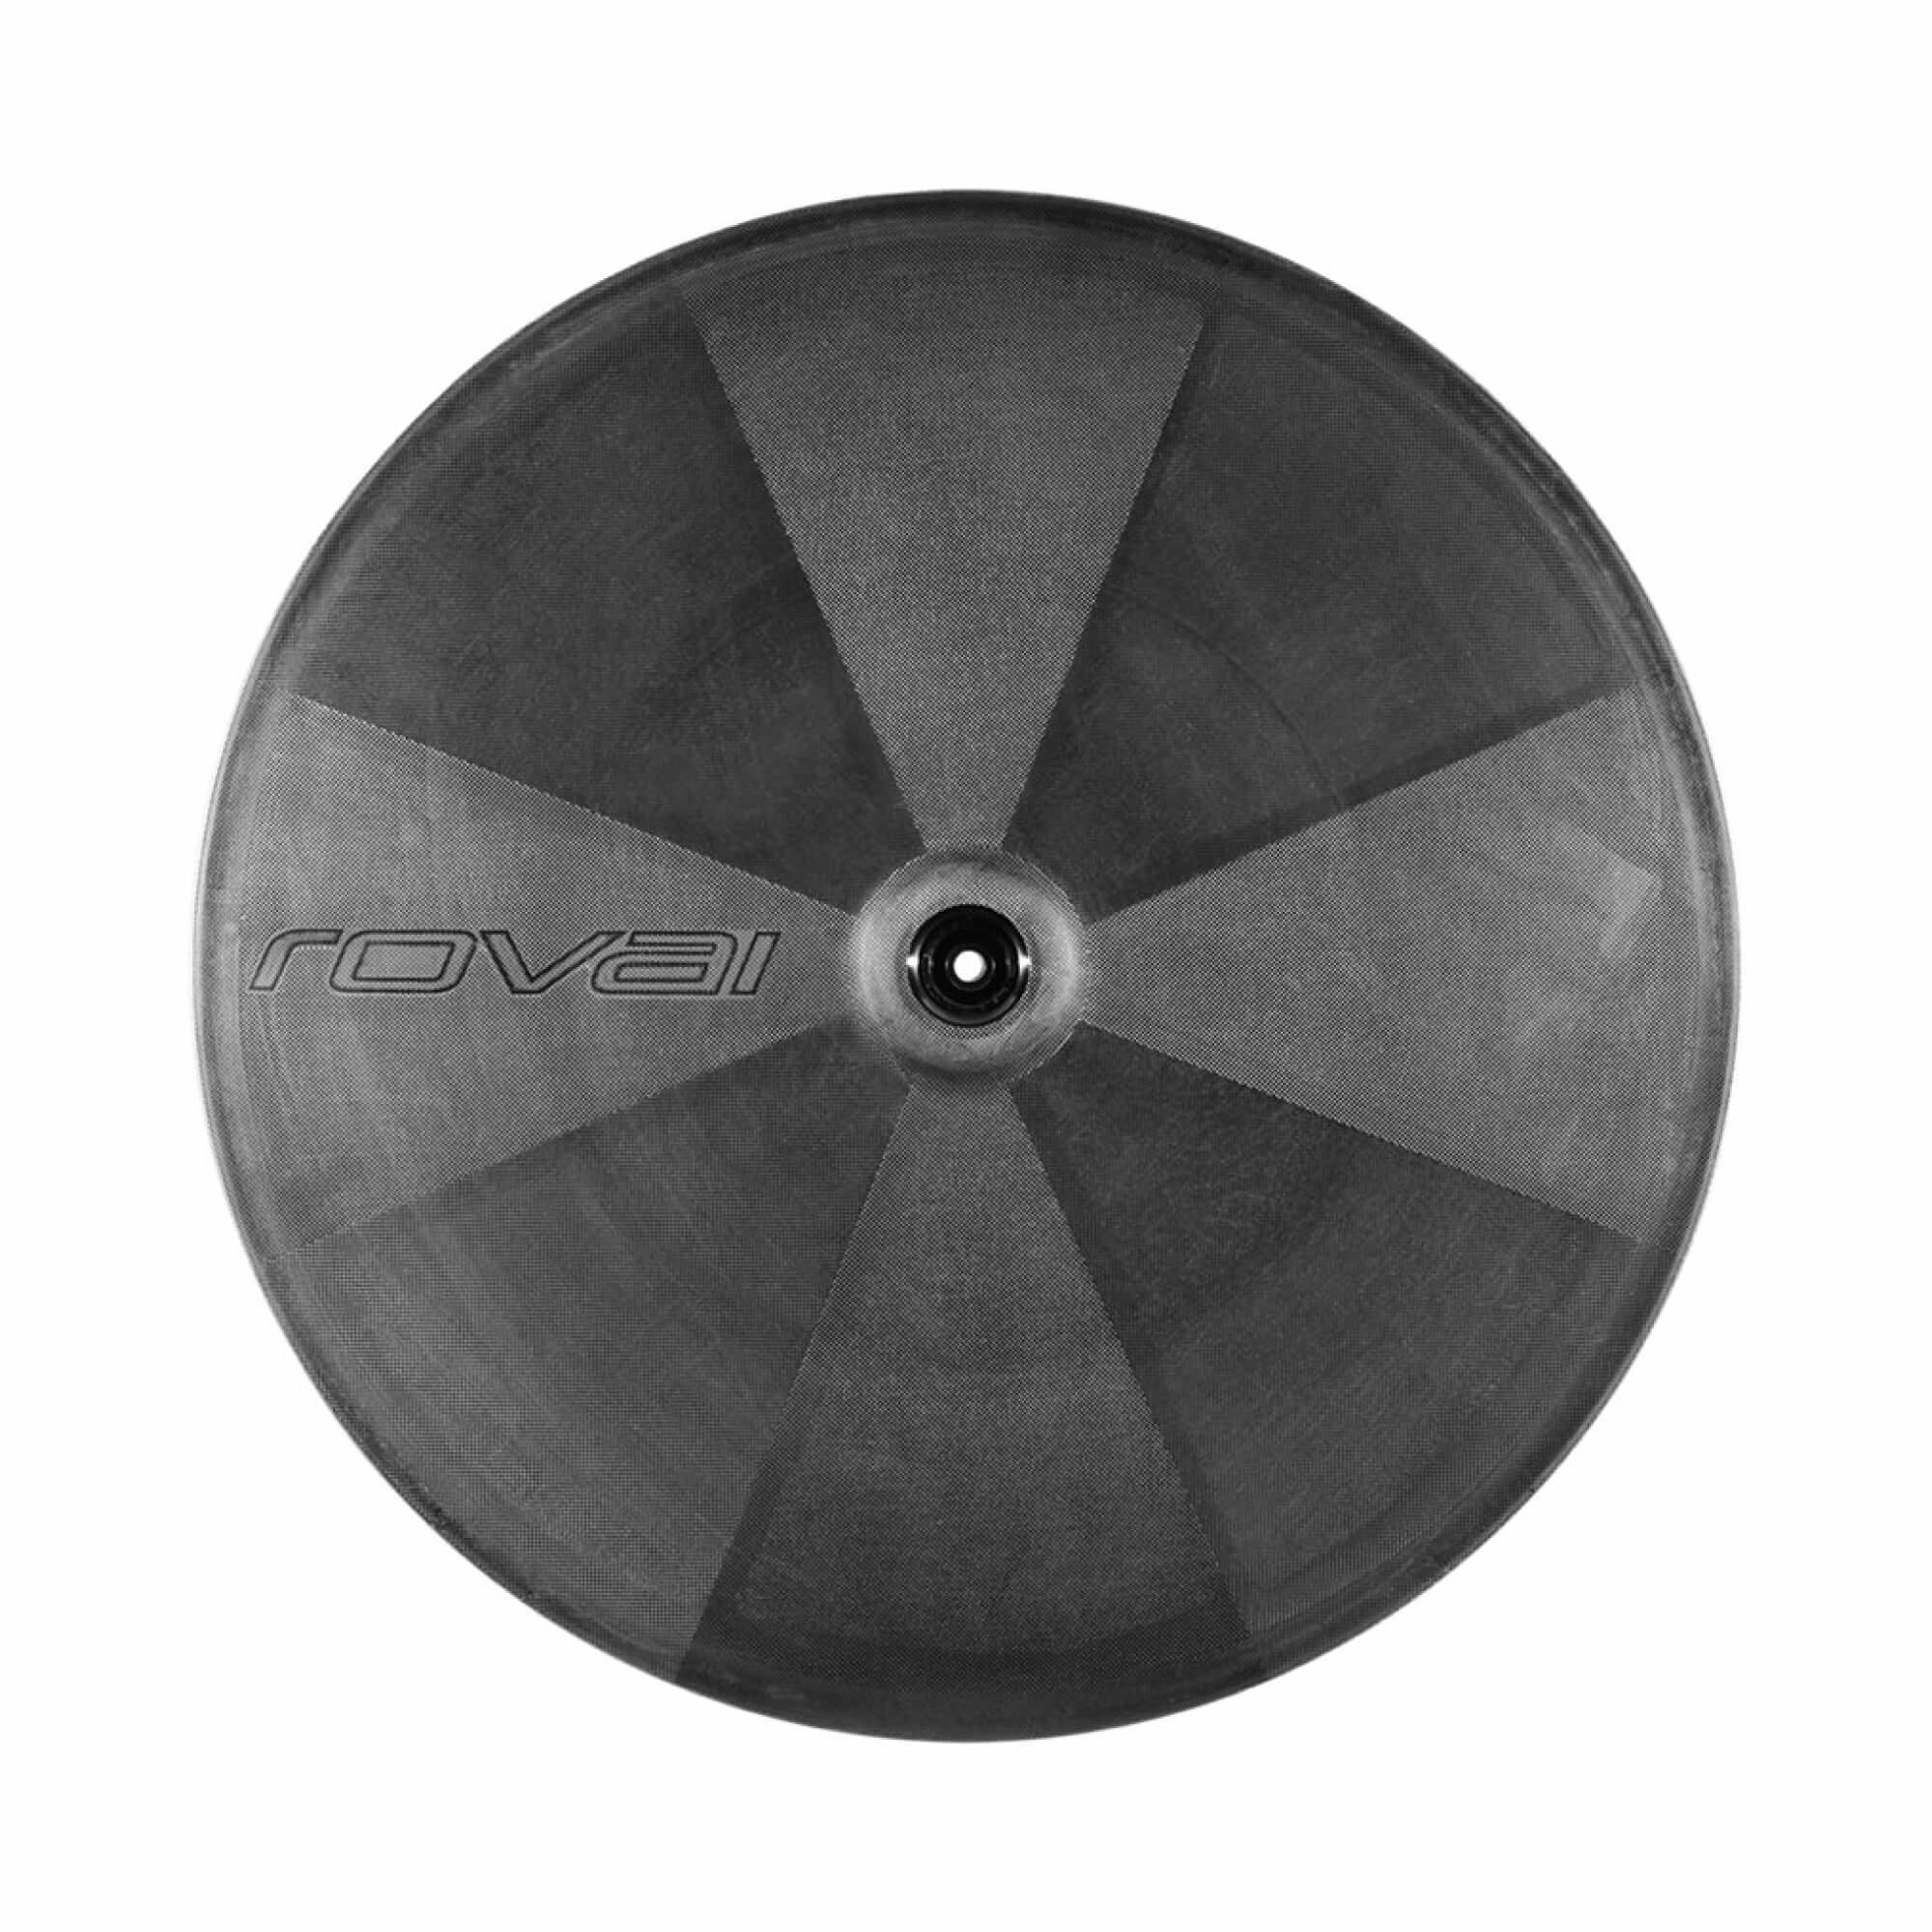 Roval 321 Disc Carbon/Gloss White - Disc Brake 2021-4